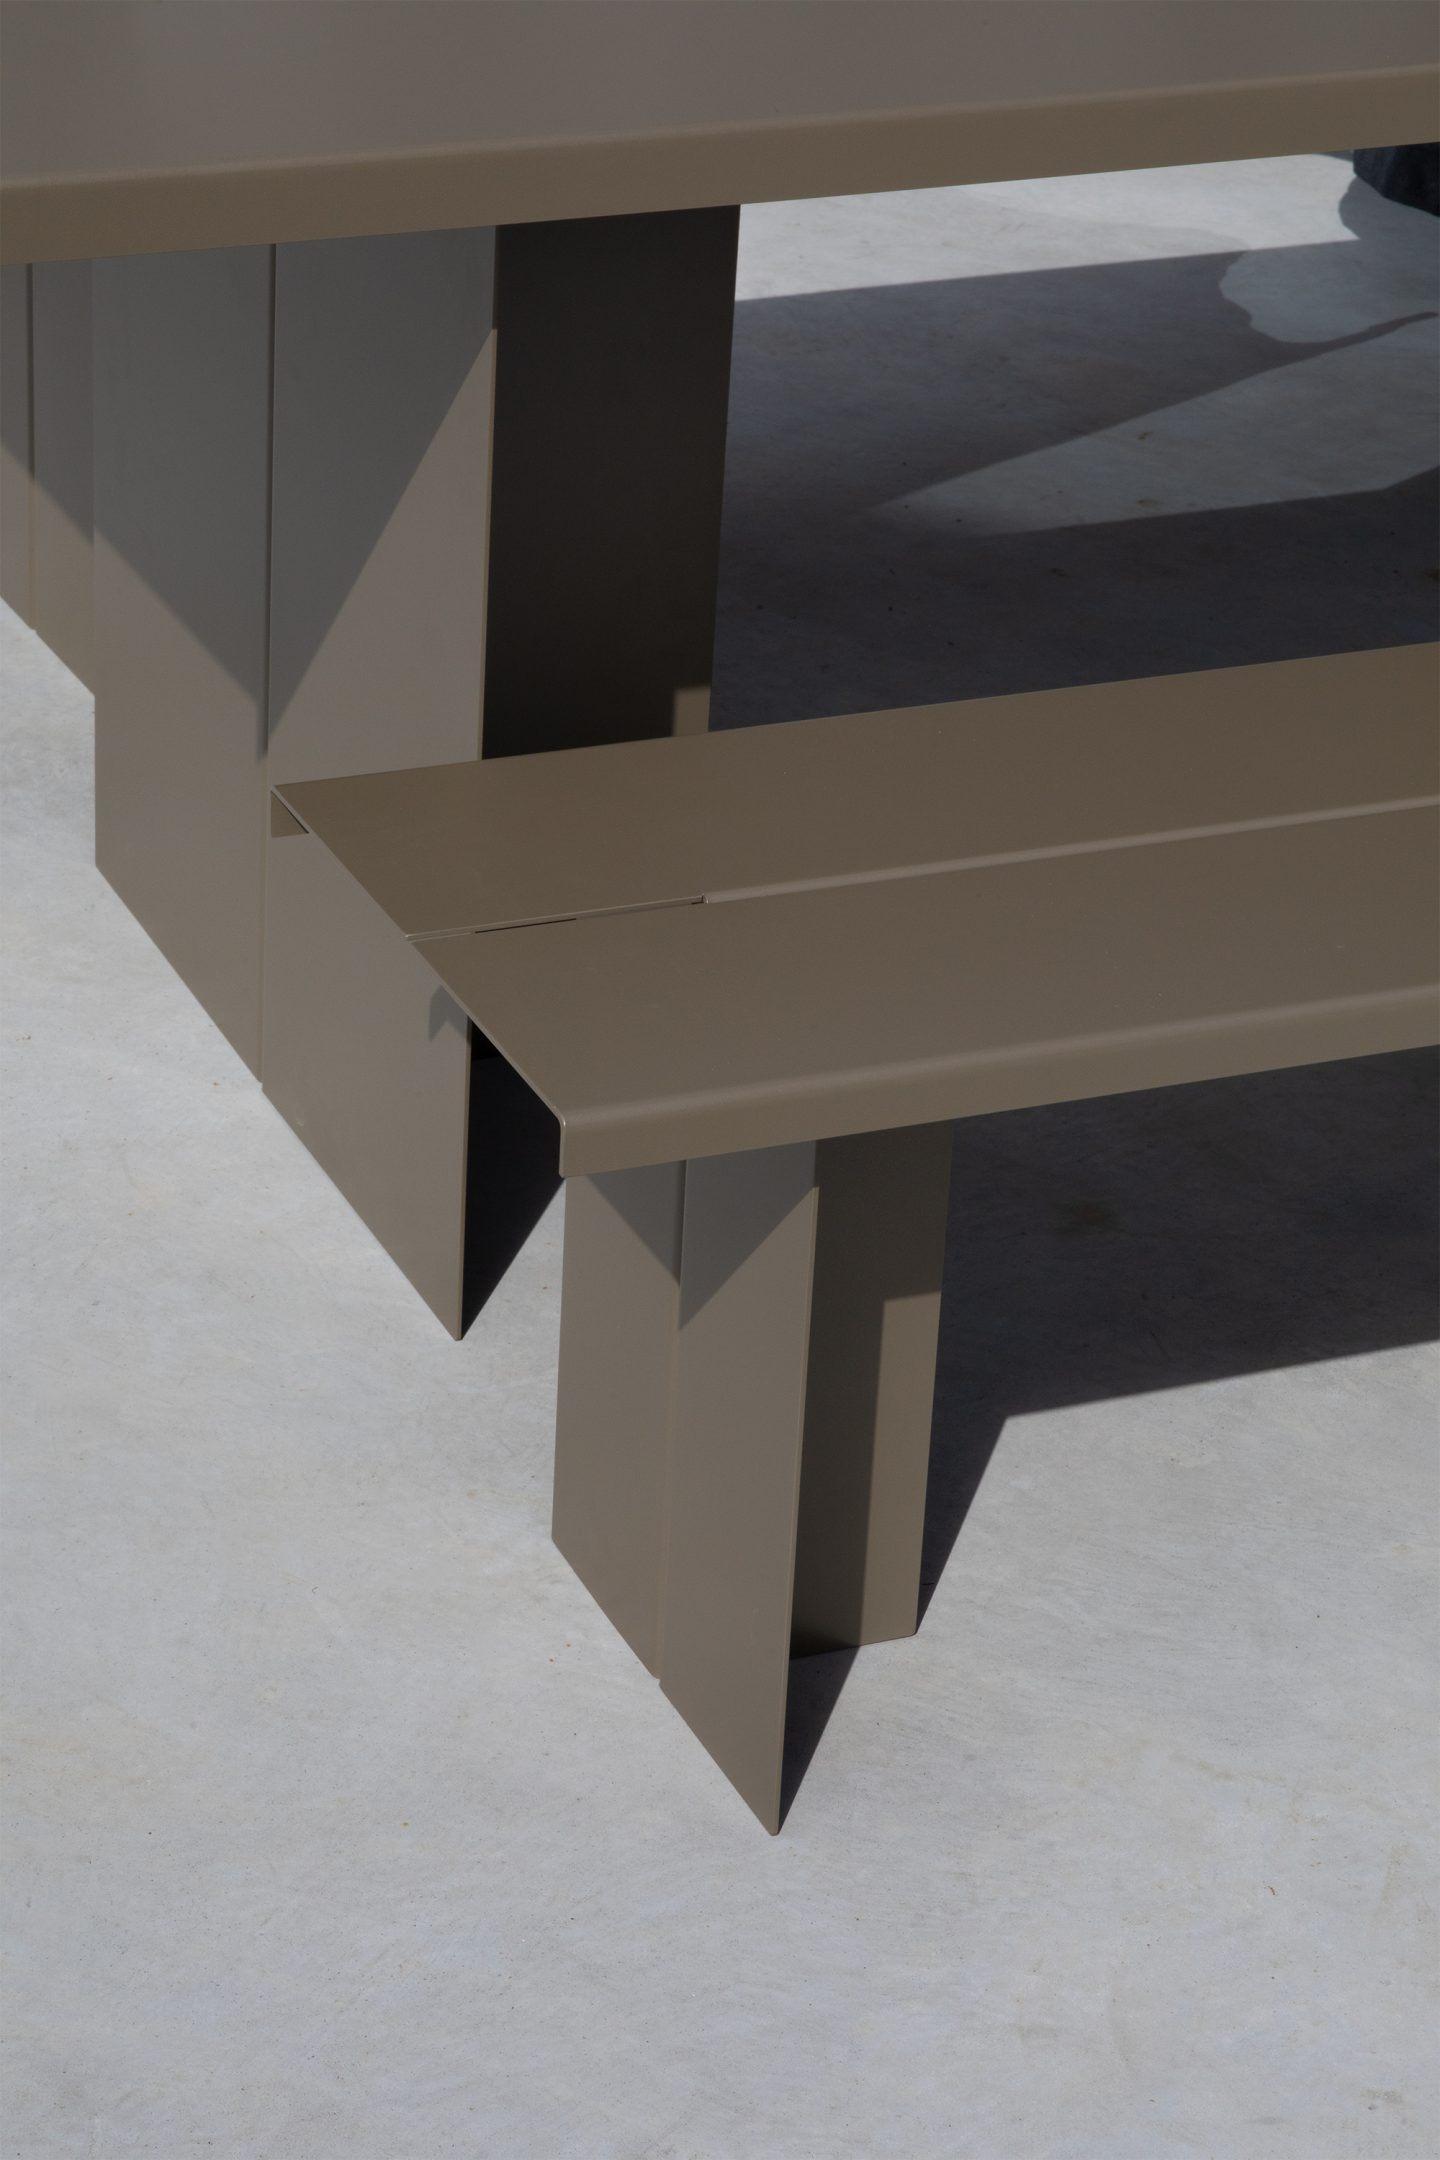 IGNANT-Design-Objekte-Unserer-Tage-Zebe-Table-6